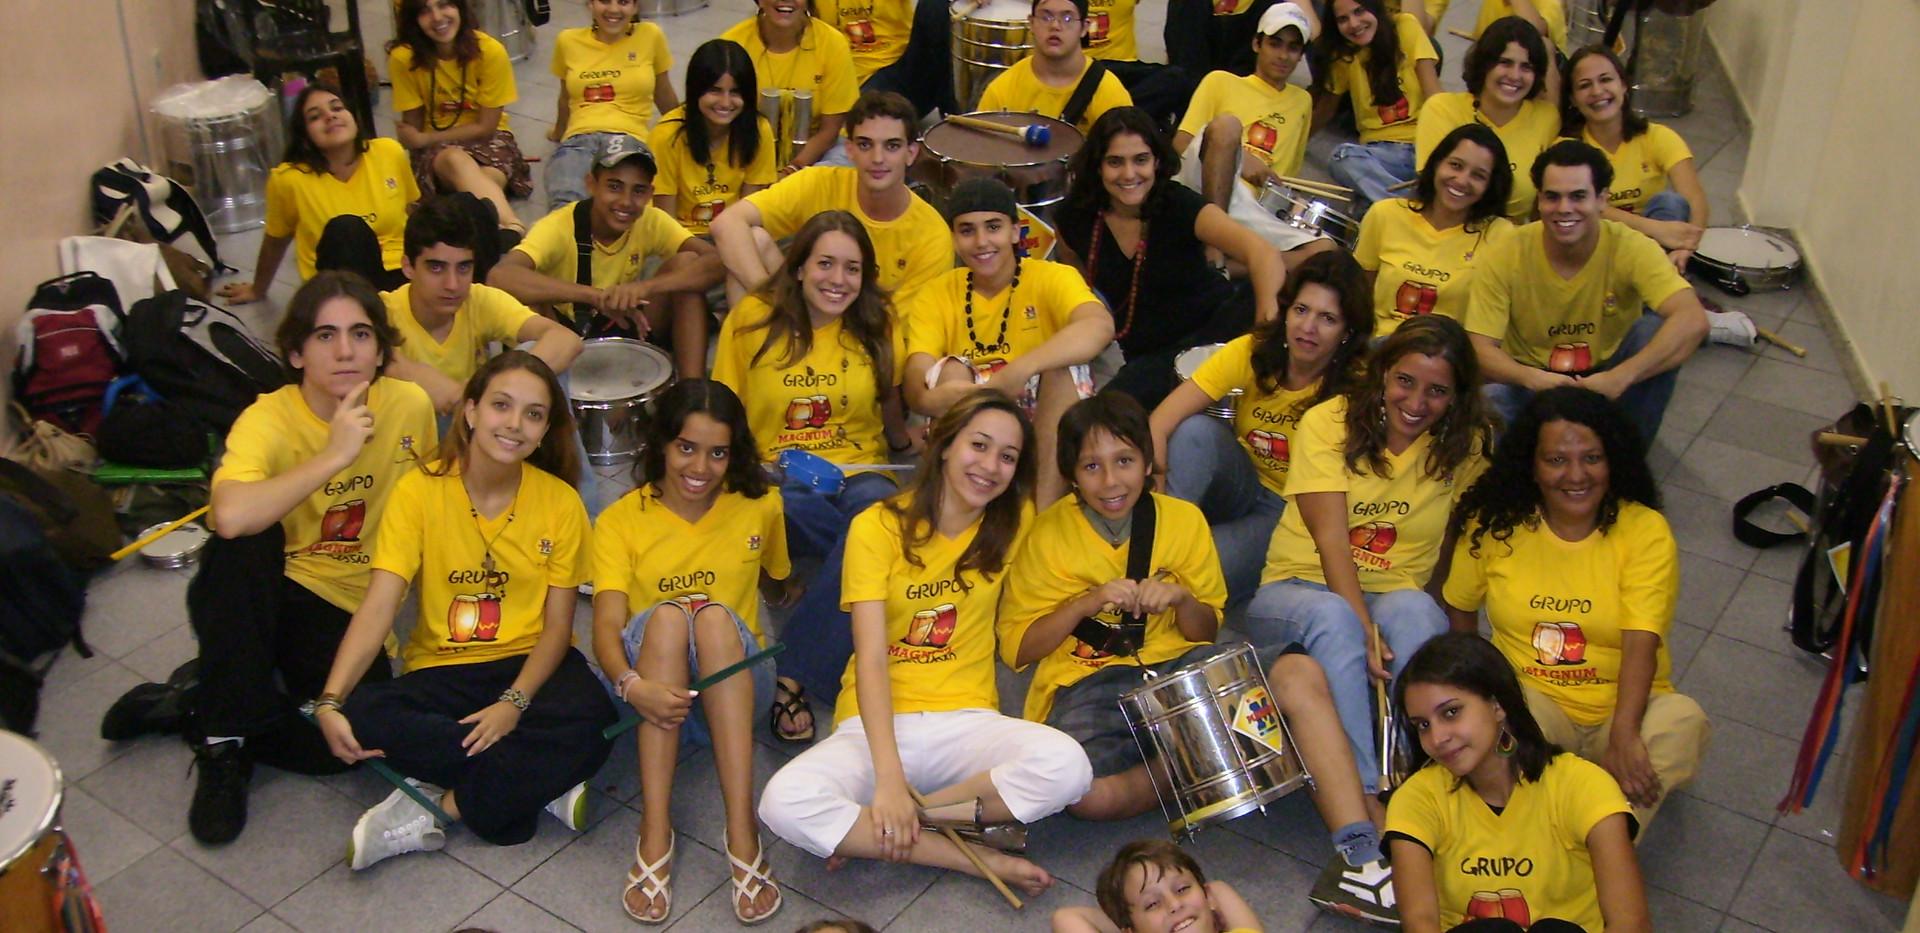 Grupo Magnum de Percussao, Belo Horizonte, 2008